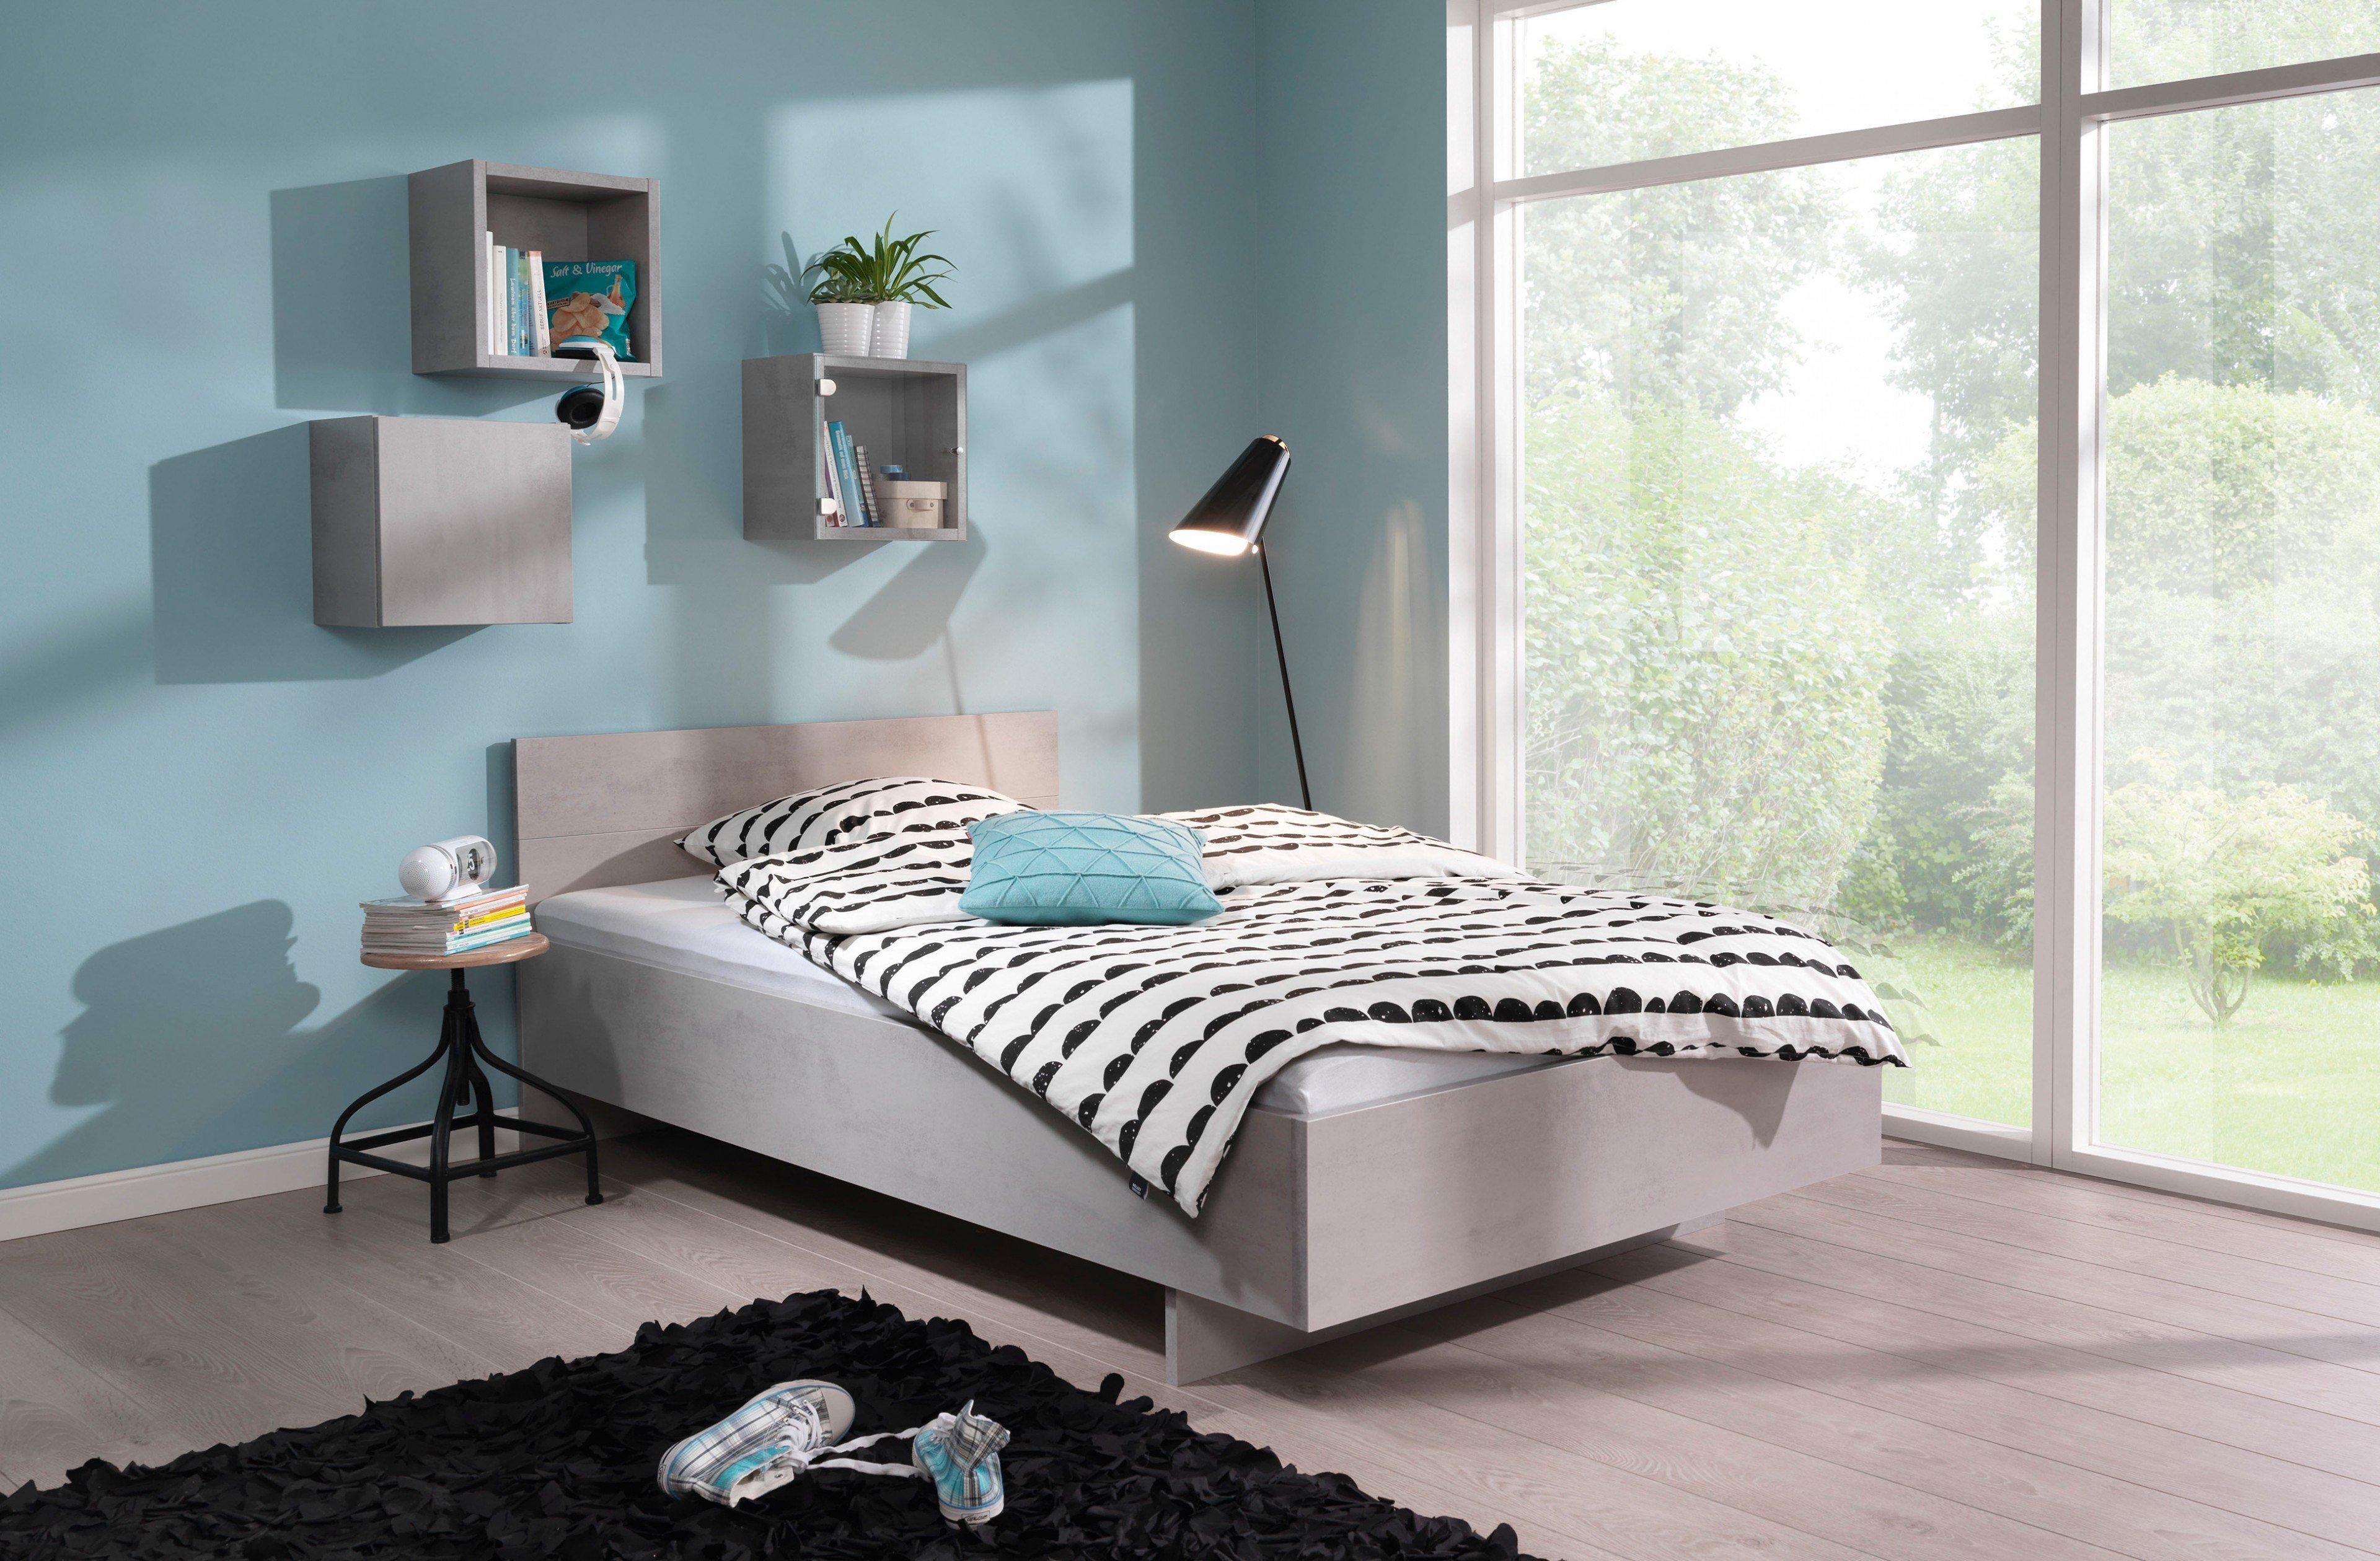 Wellemöbel GROW UP SLEEPING Bett Beton-Optik | Möbel Letz - Ihr ...